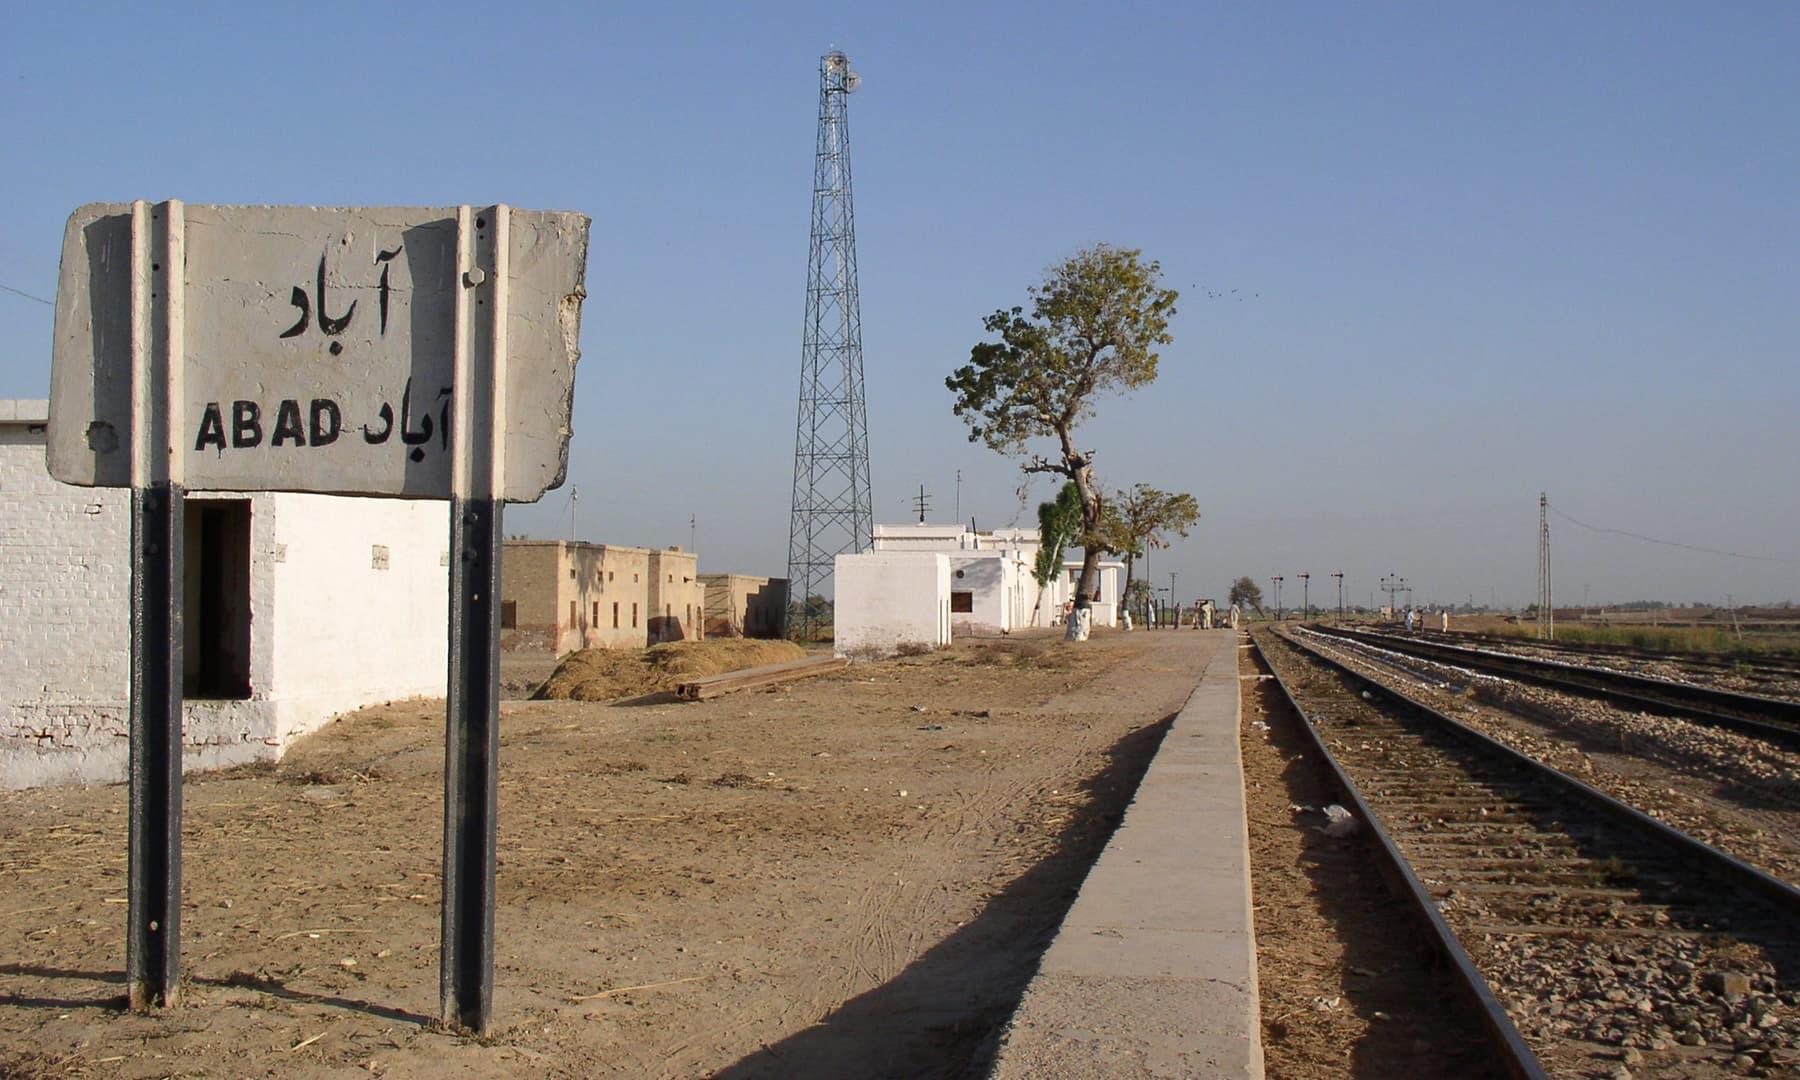 آباد اسٹیشن